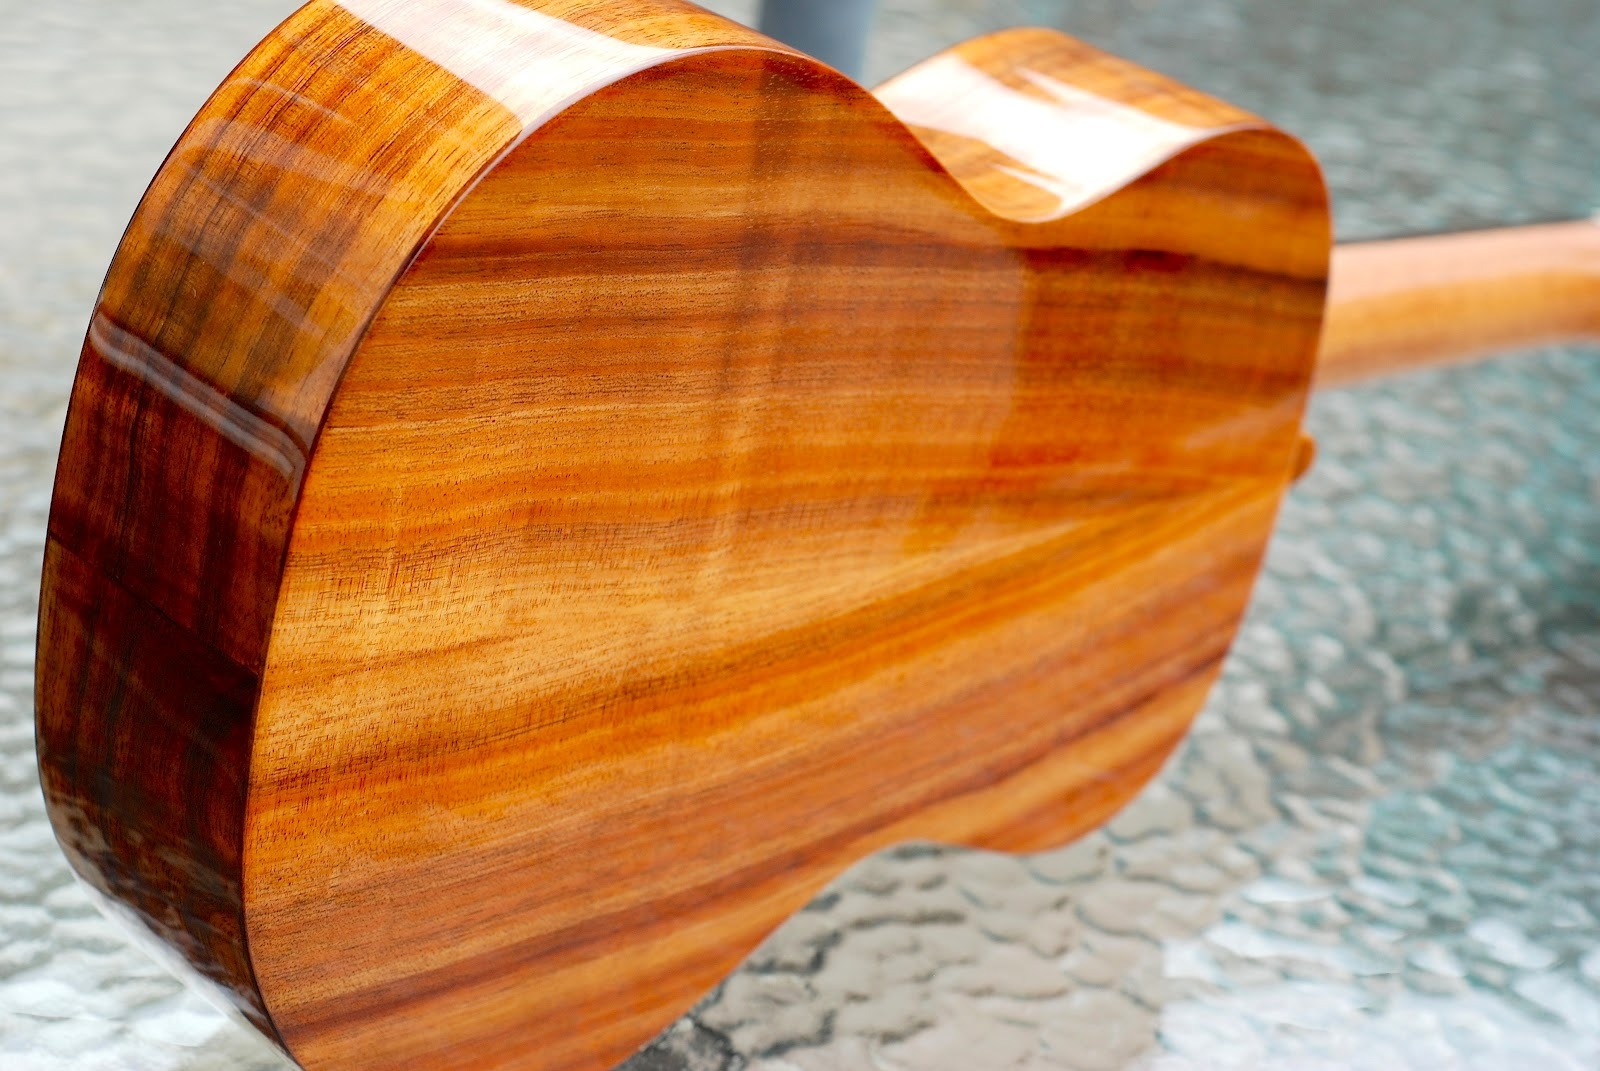 Koa Wood And Silver Rings